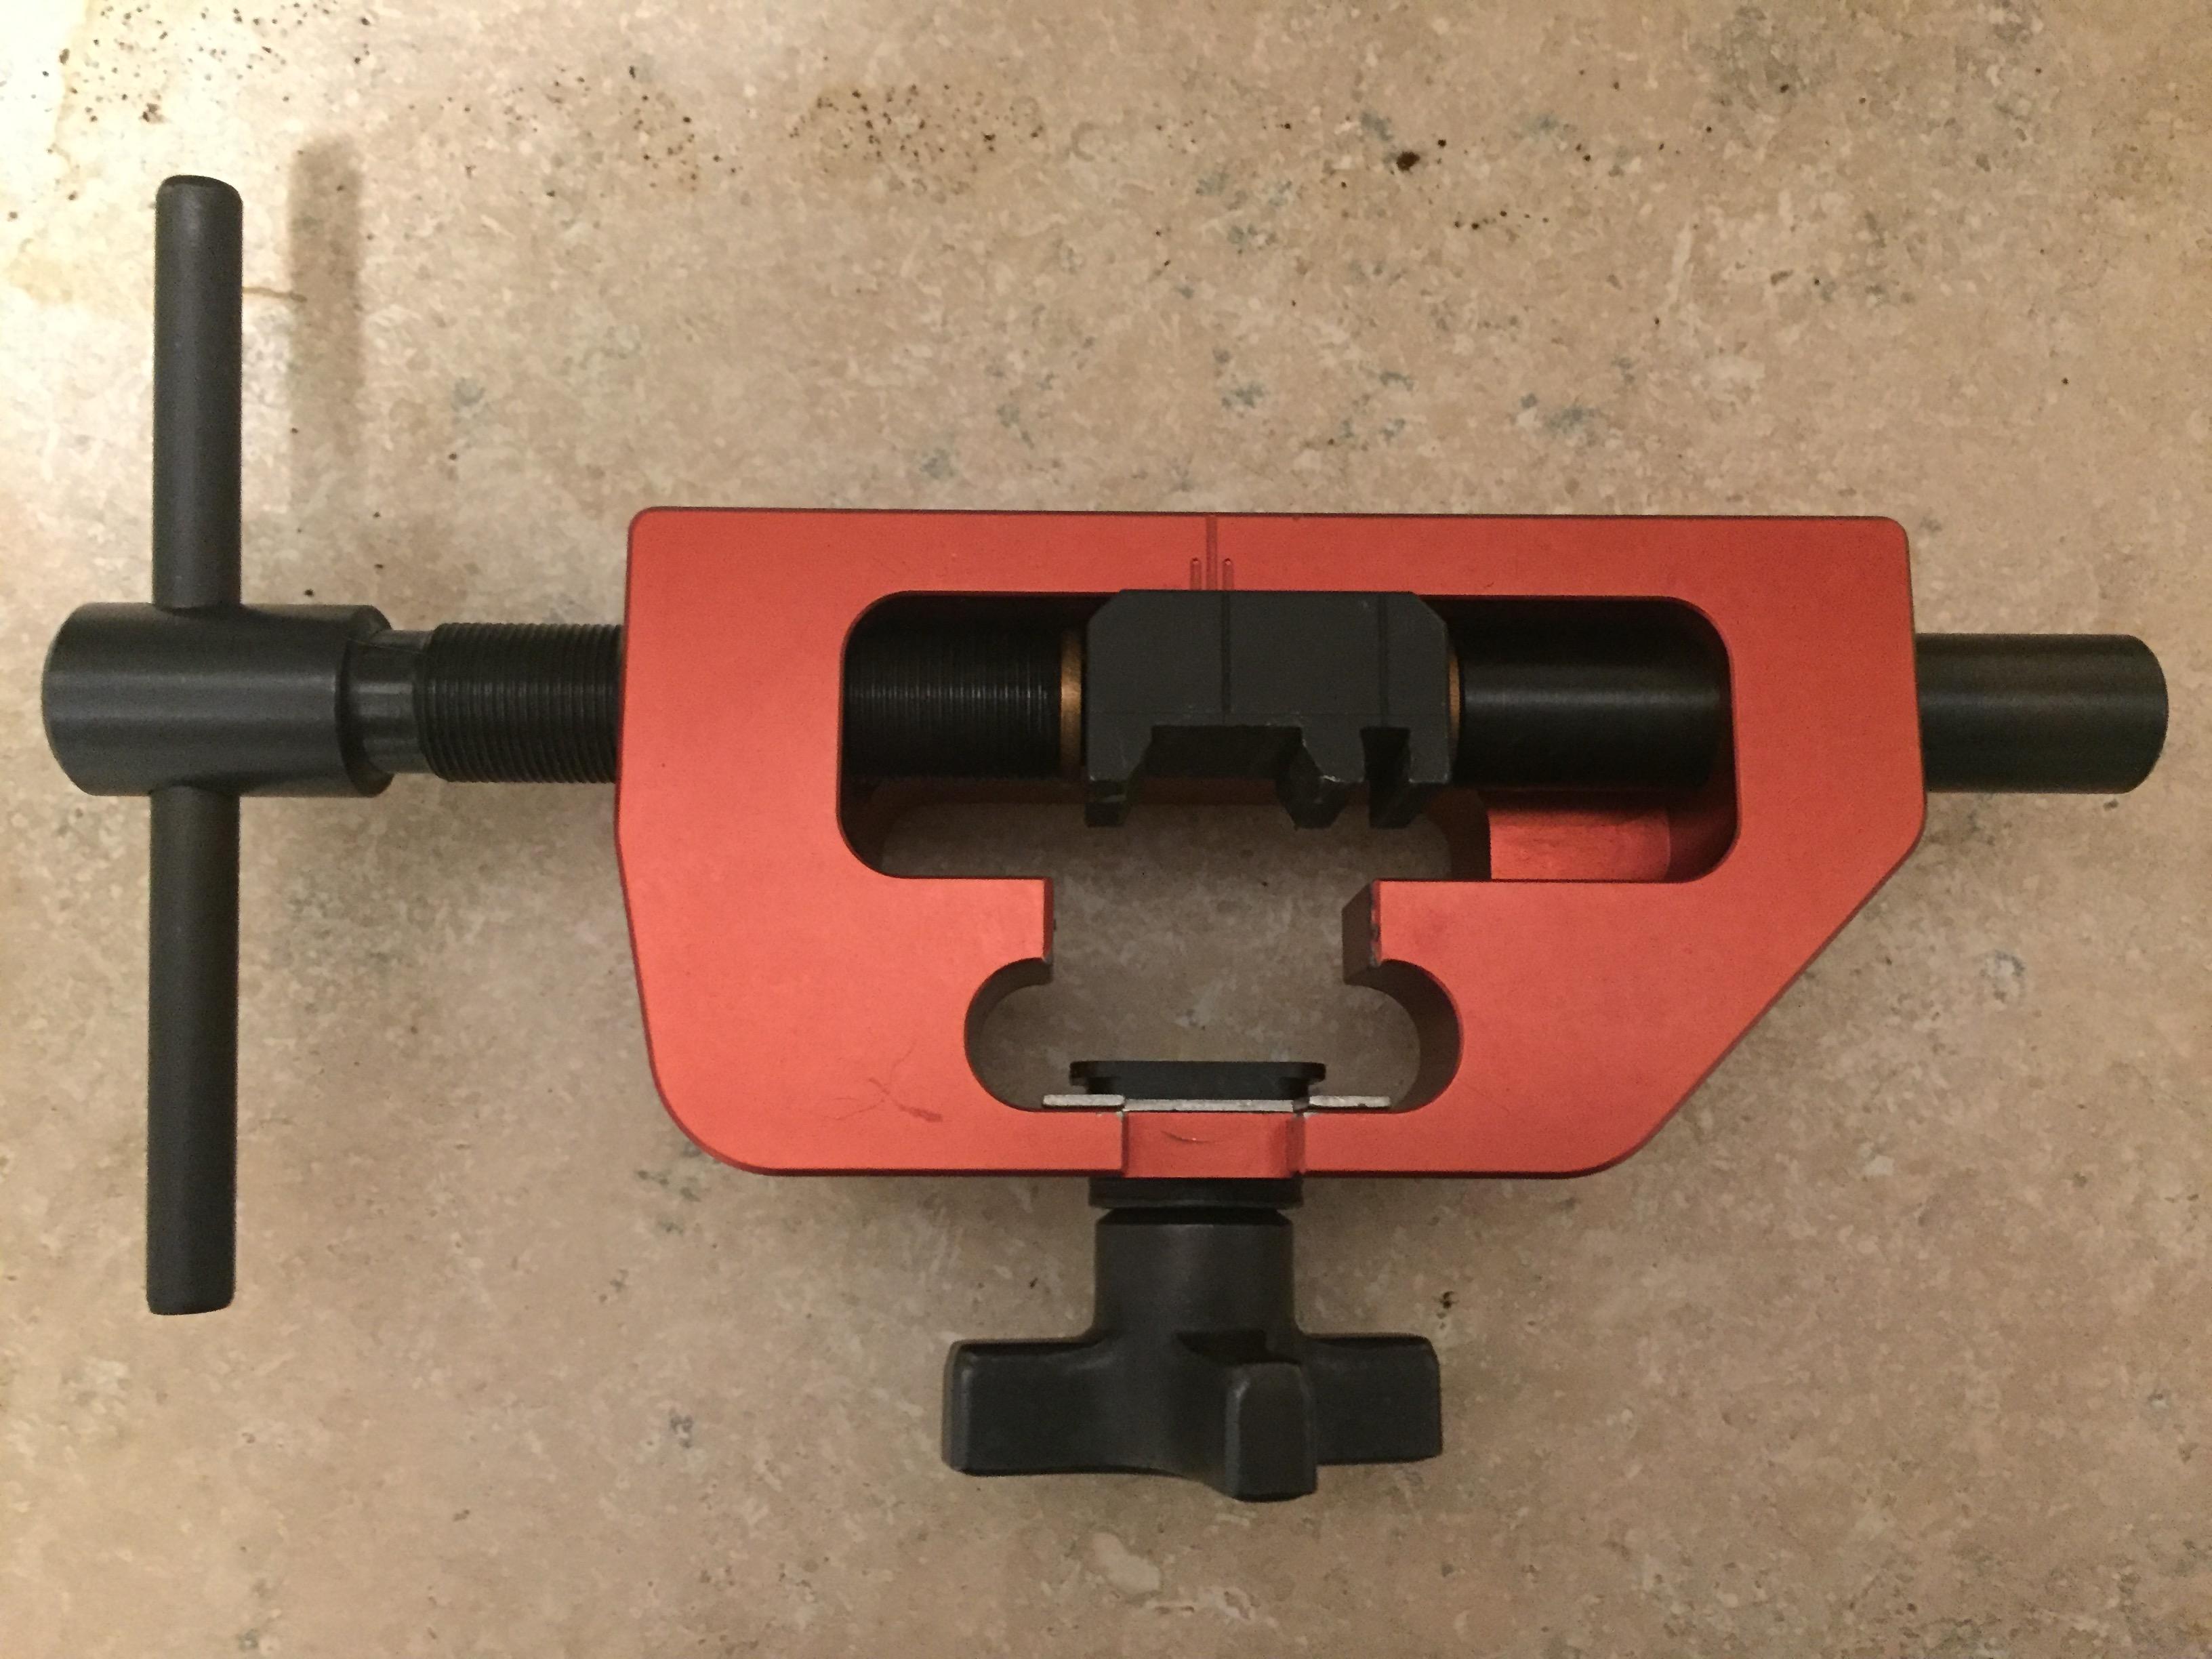 WTS: USP Compact Magazines, Match Trigger Kit, Sight Pusher-img_1076.jpg